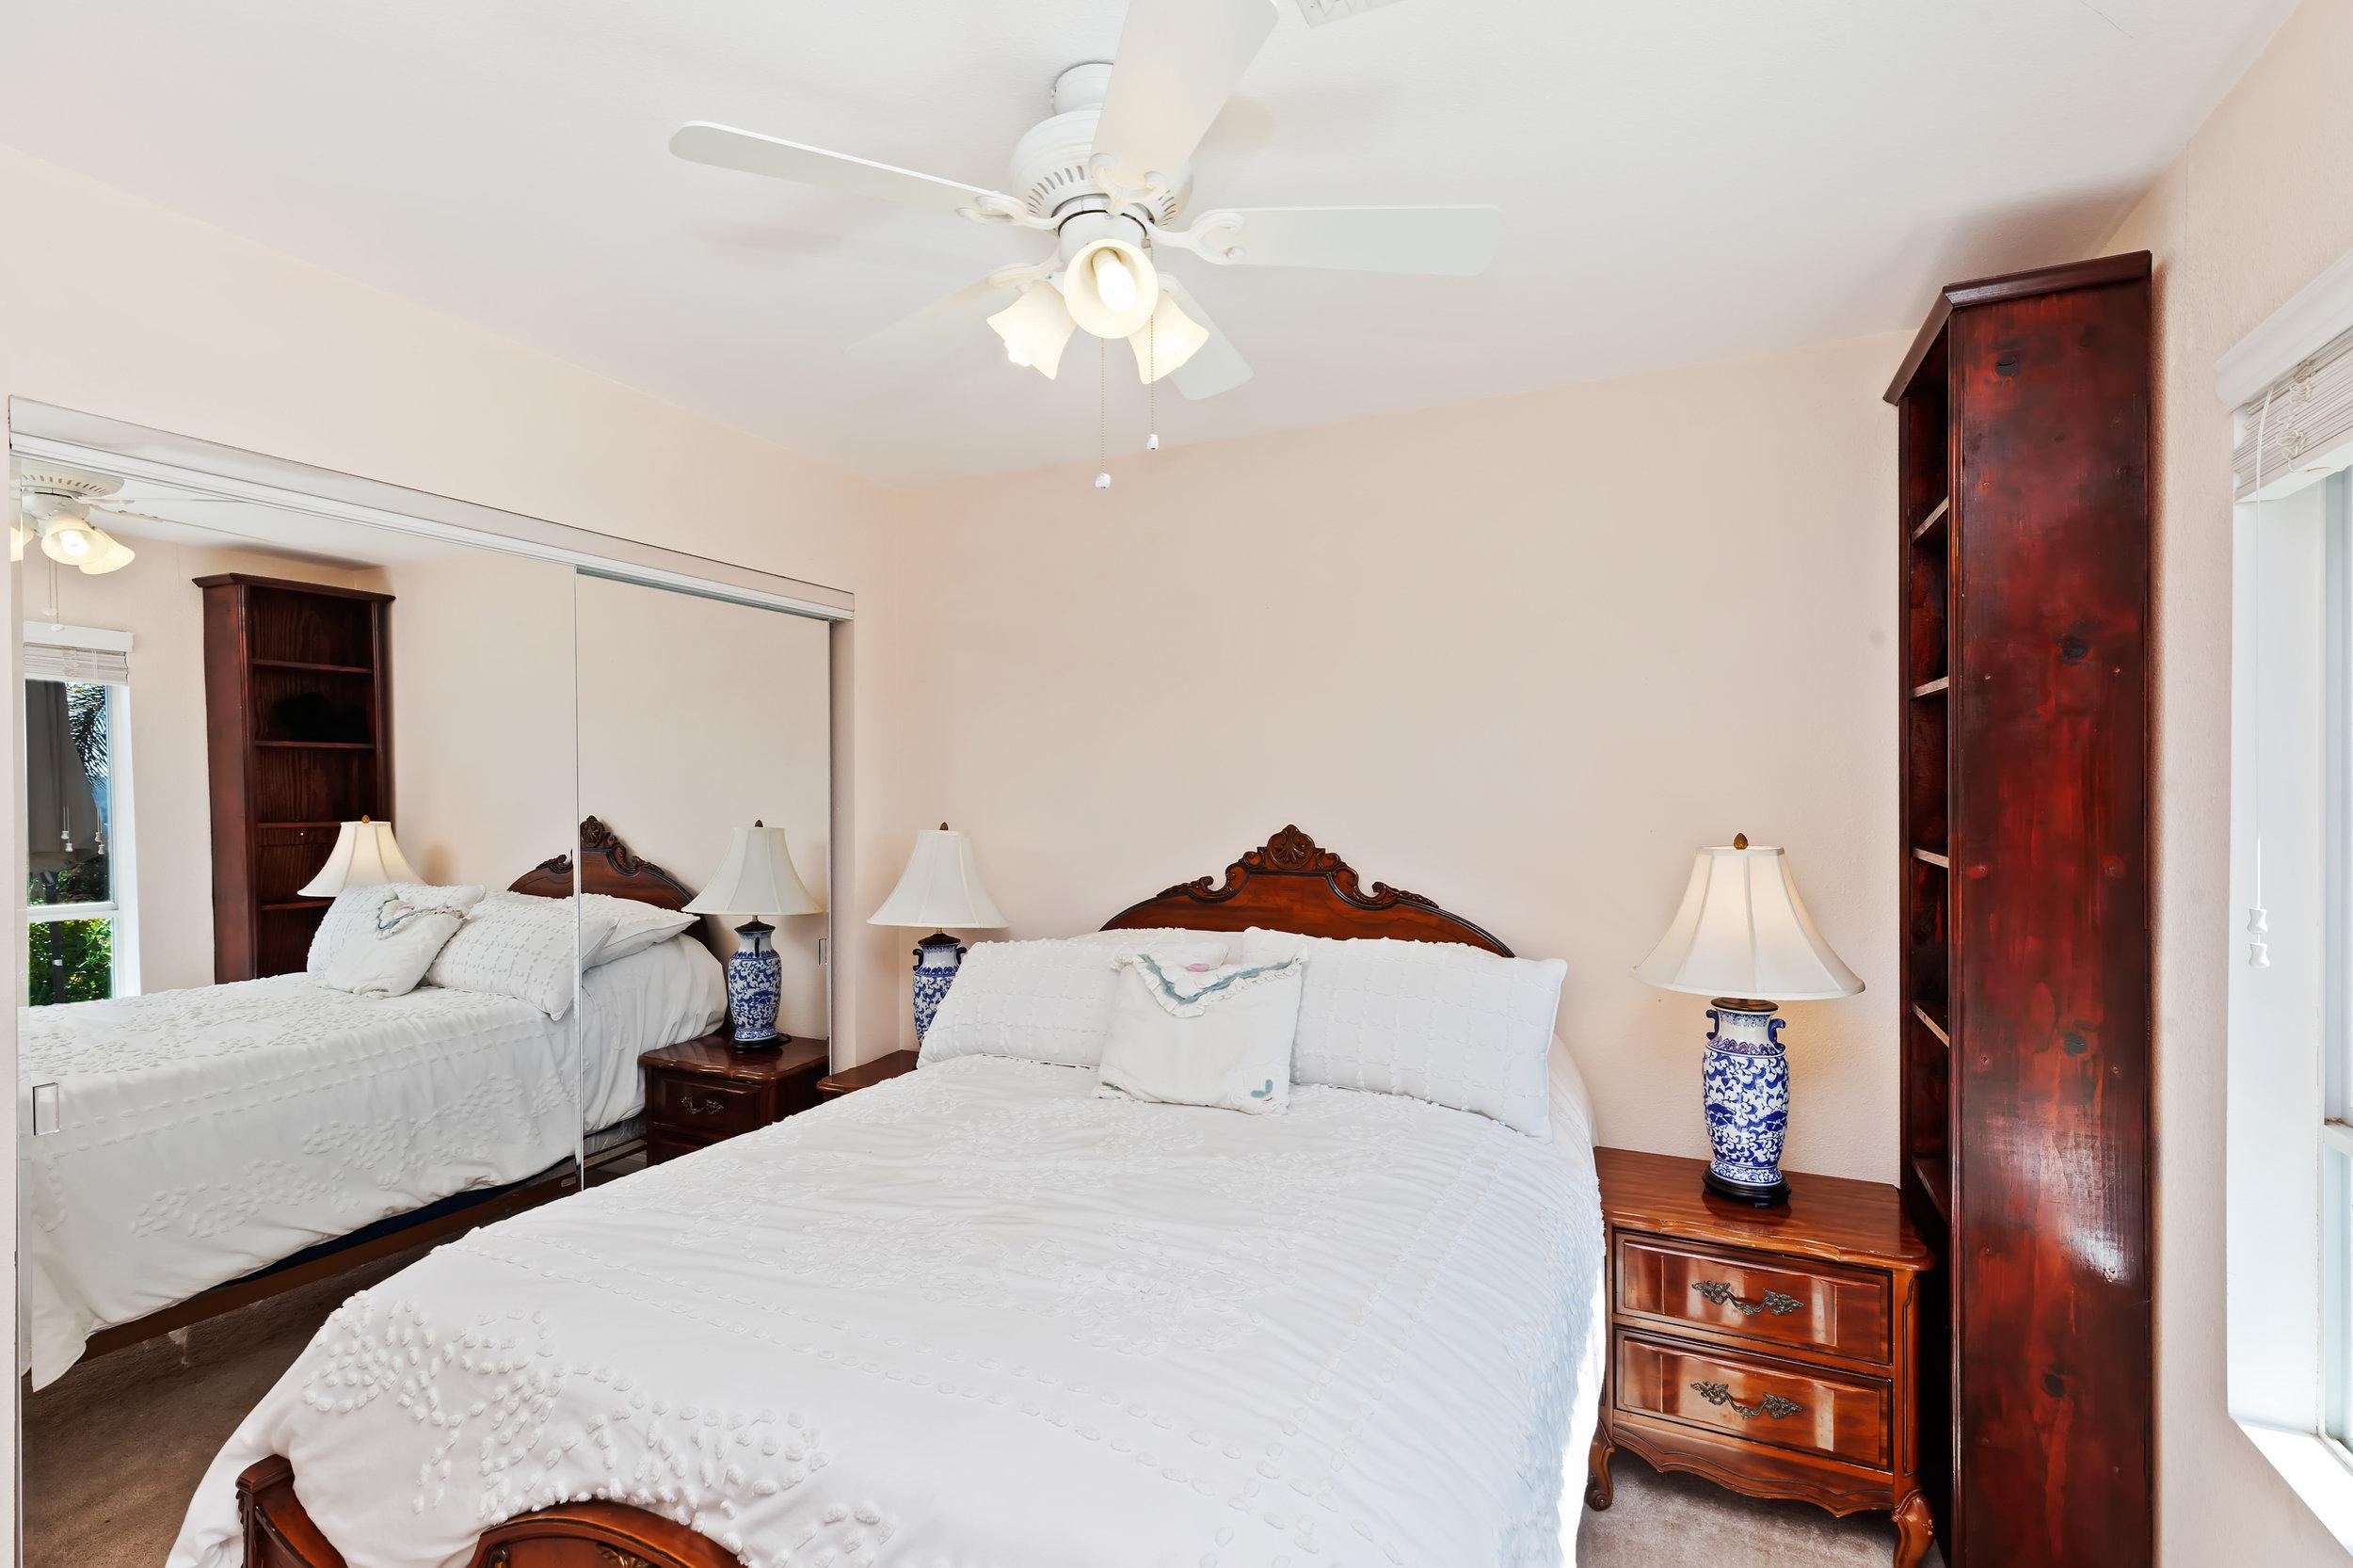 039_Bedroom 2.jpg